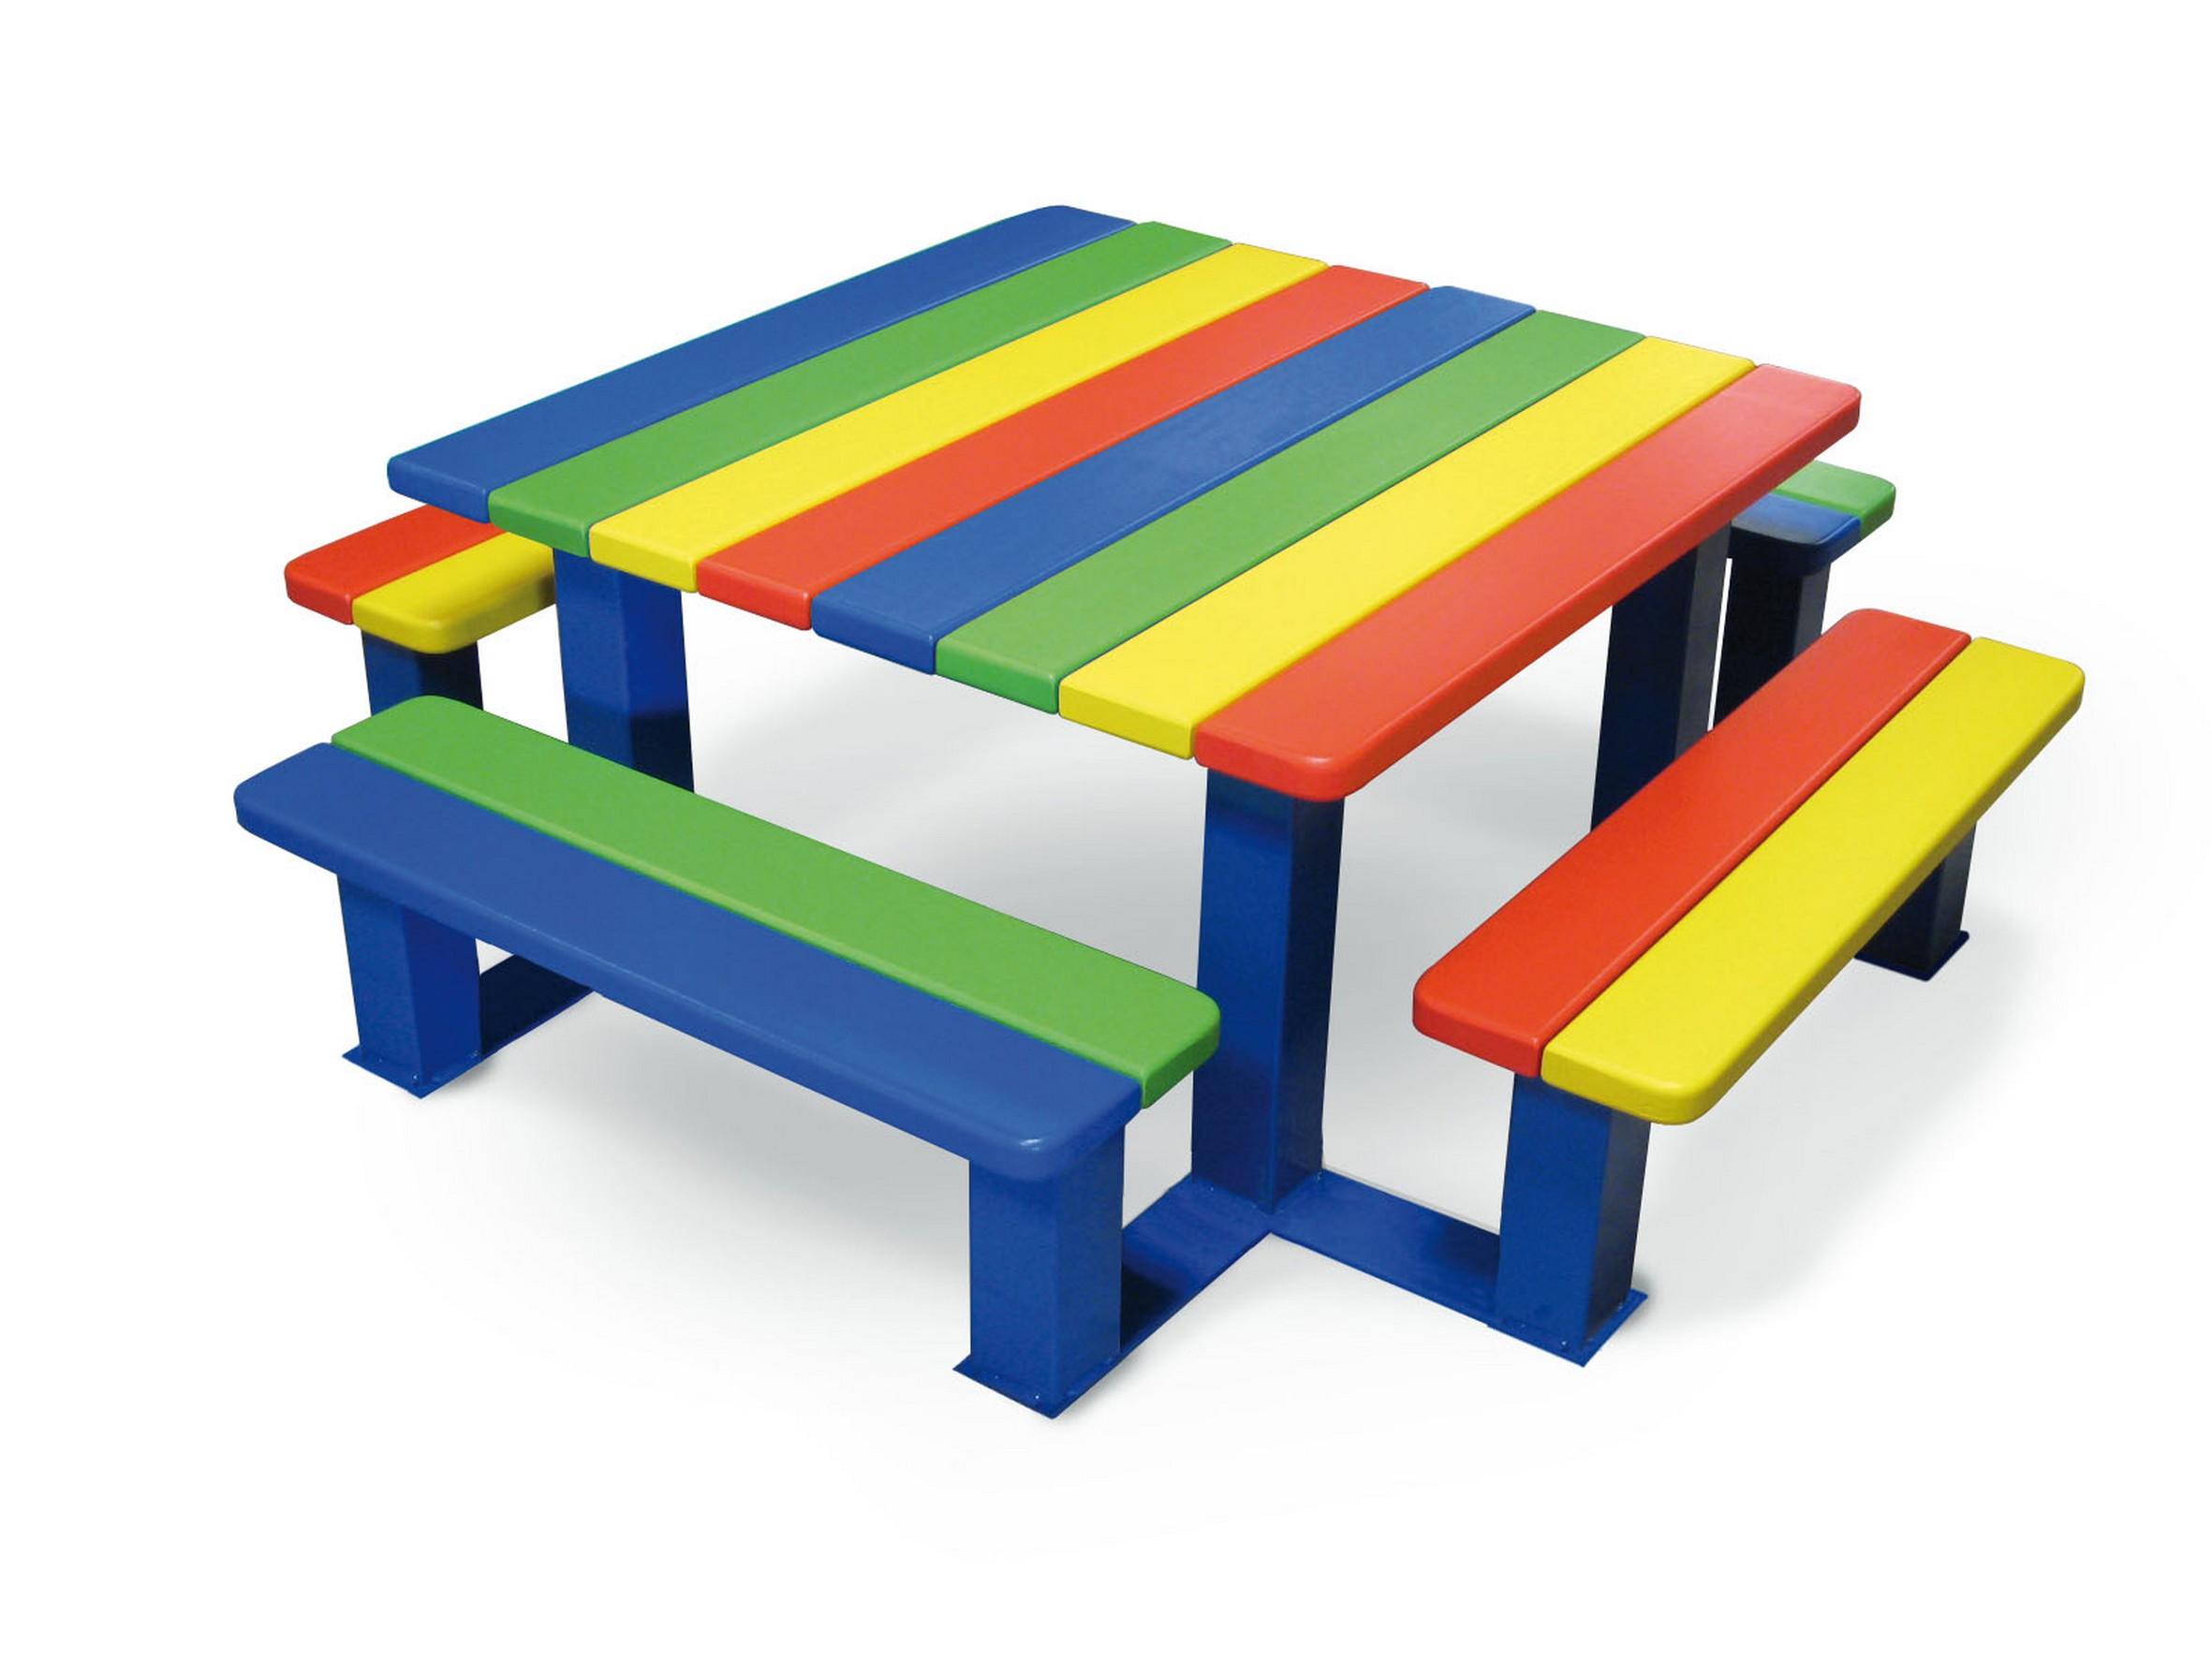 les tables mobilier enfants france urba fabricant de. Black Bedroom Furniture Sets. Home Design Ideas